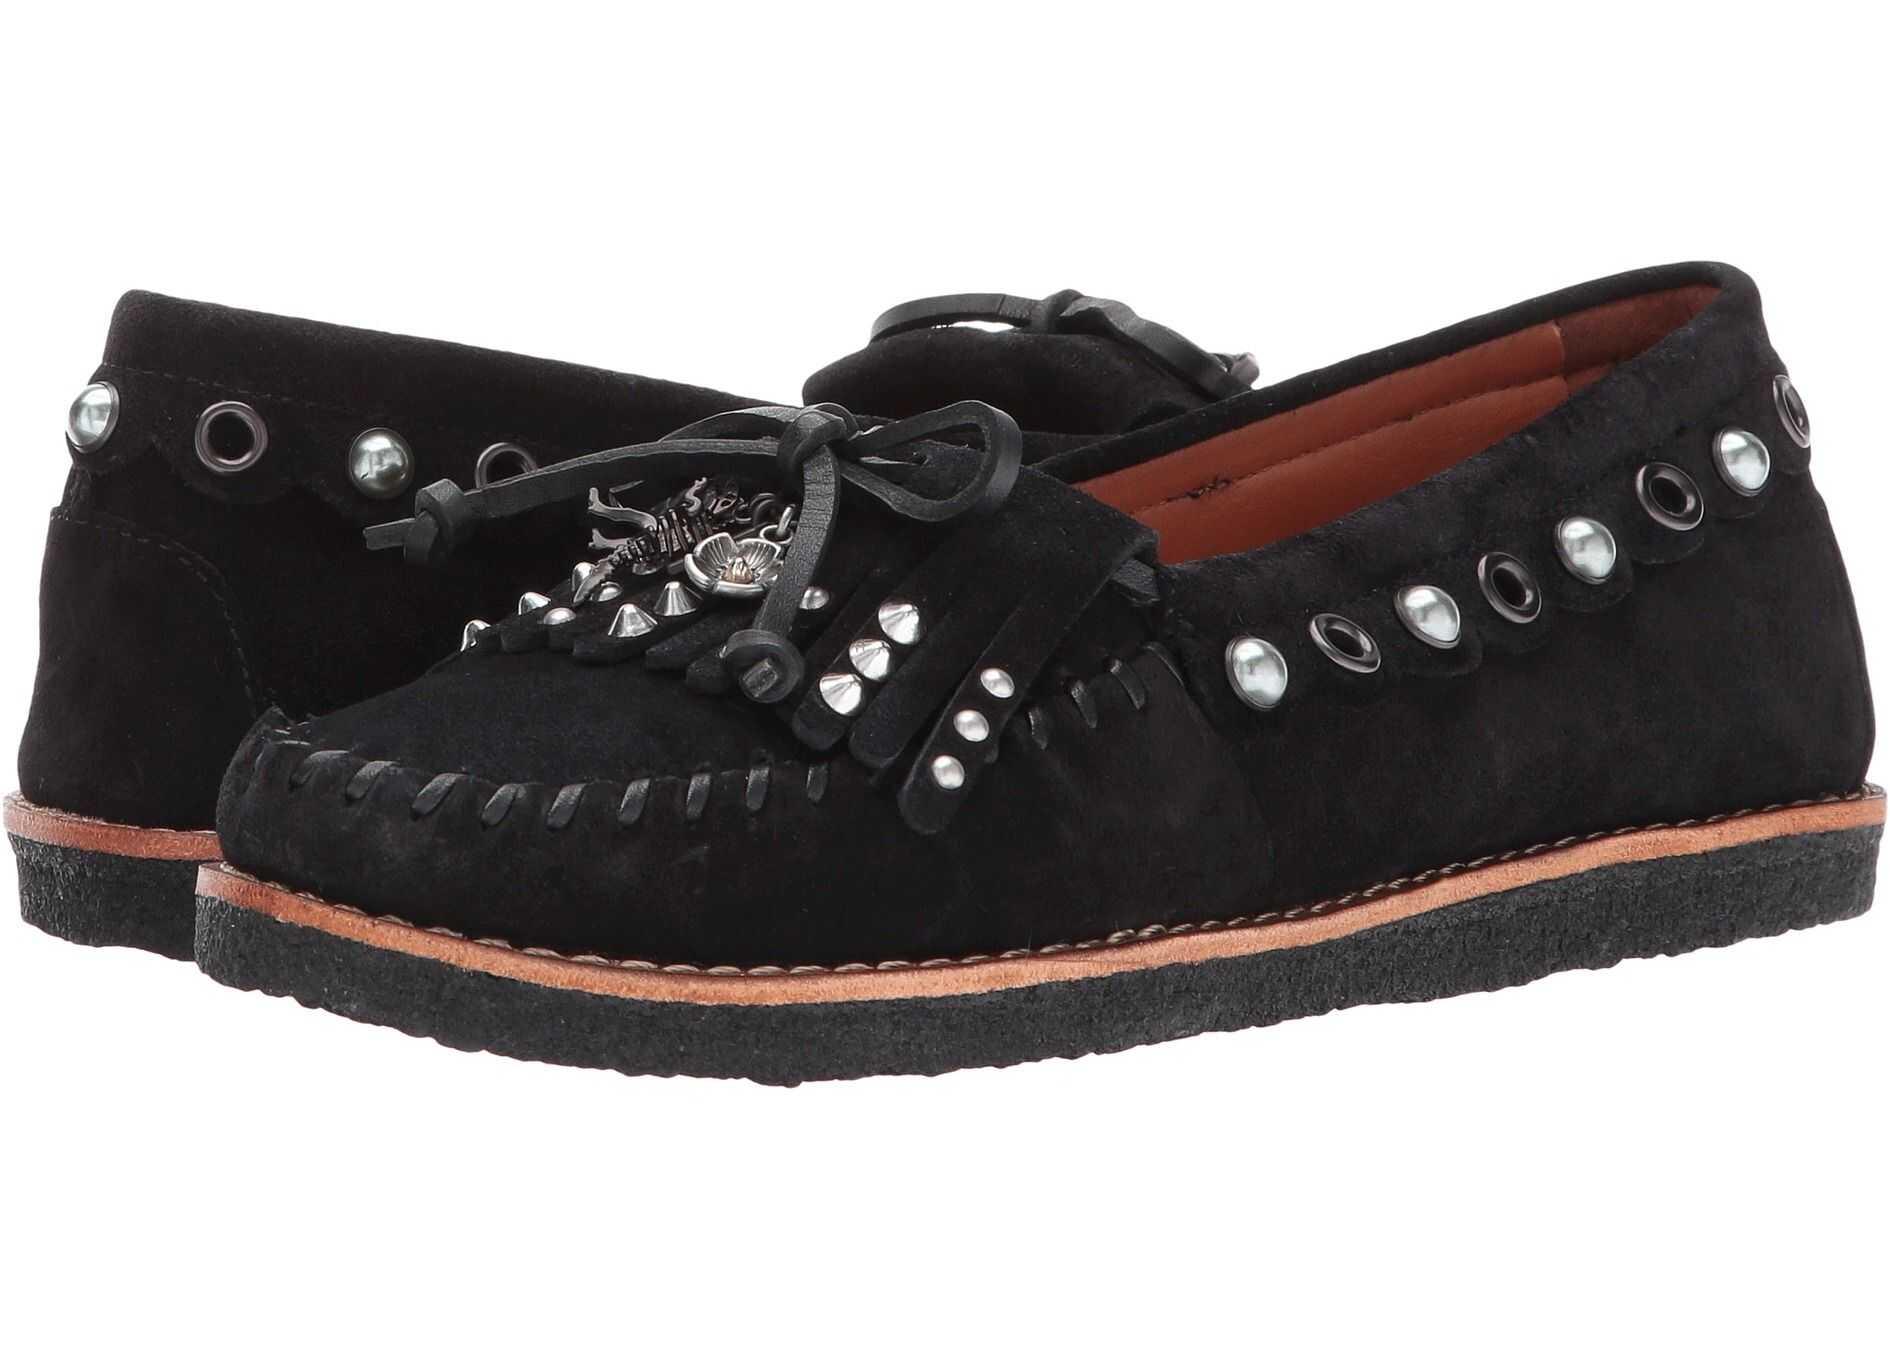 COACH Roccasin Slip-On Black/Black Suede